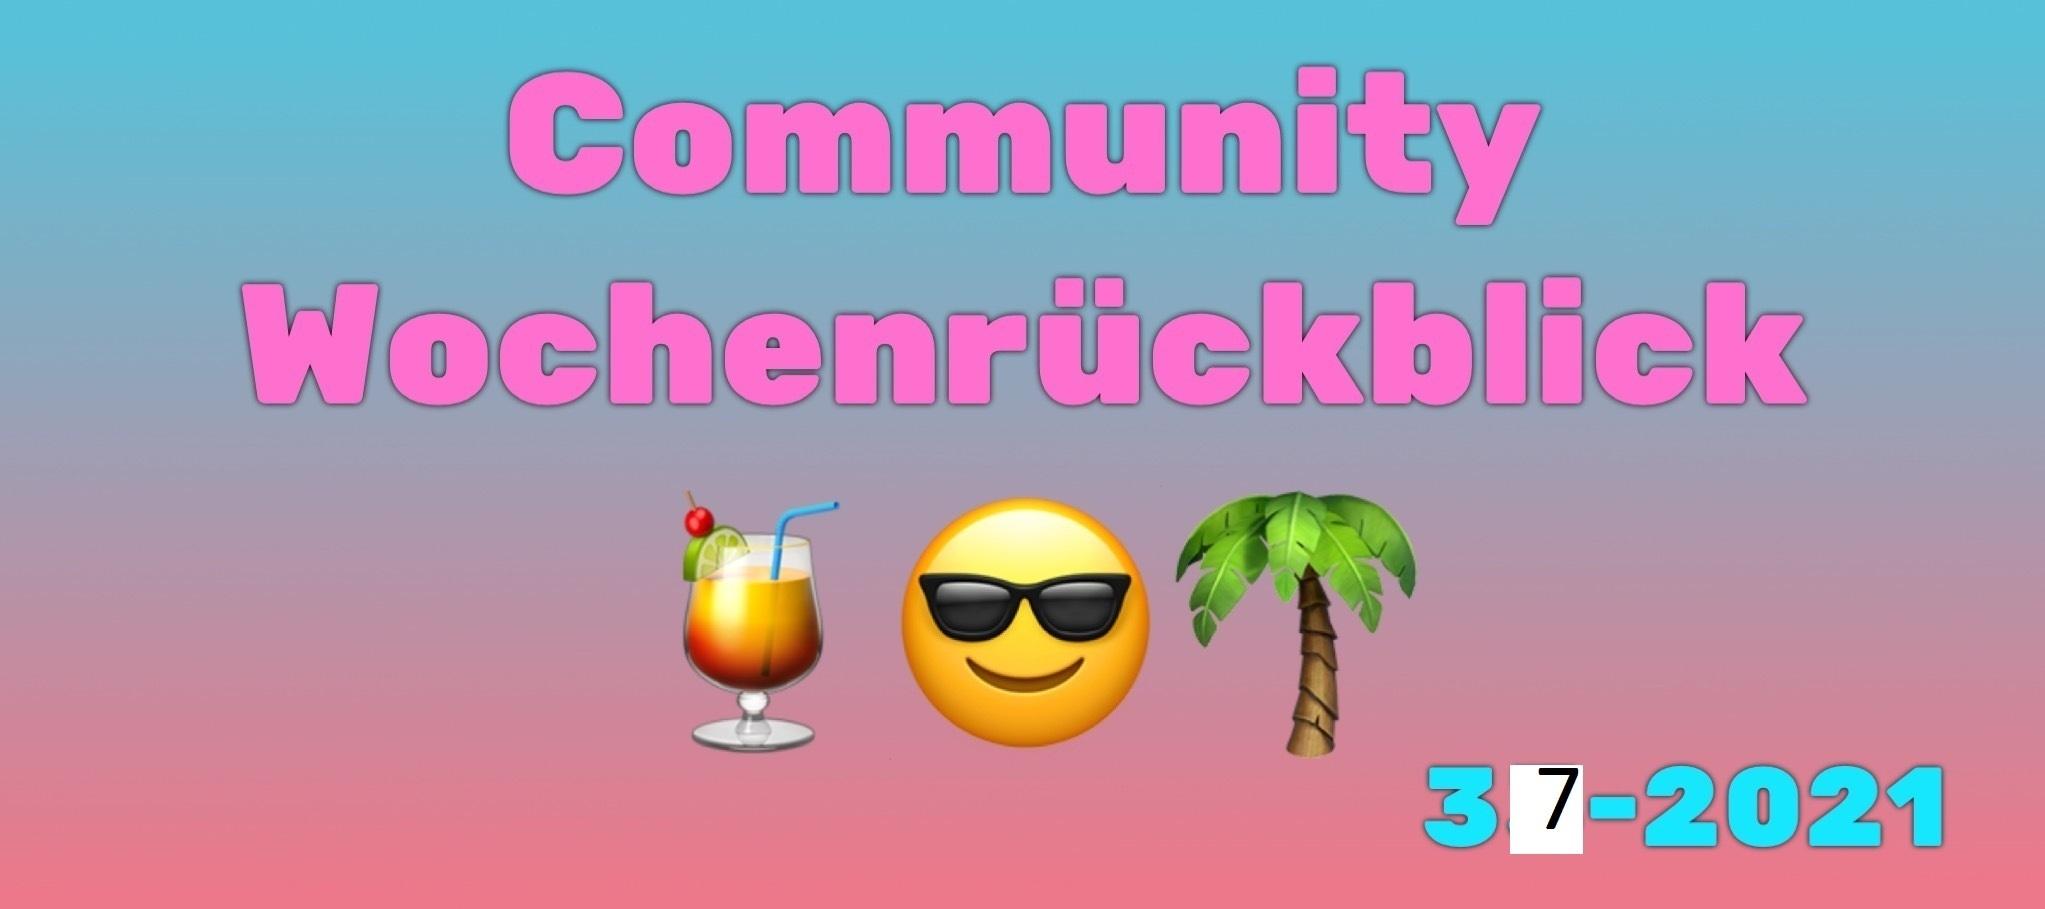 Community Wochenrückblick #37 2021